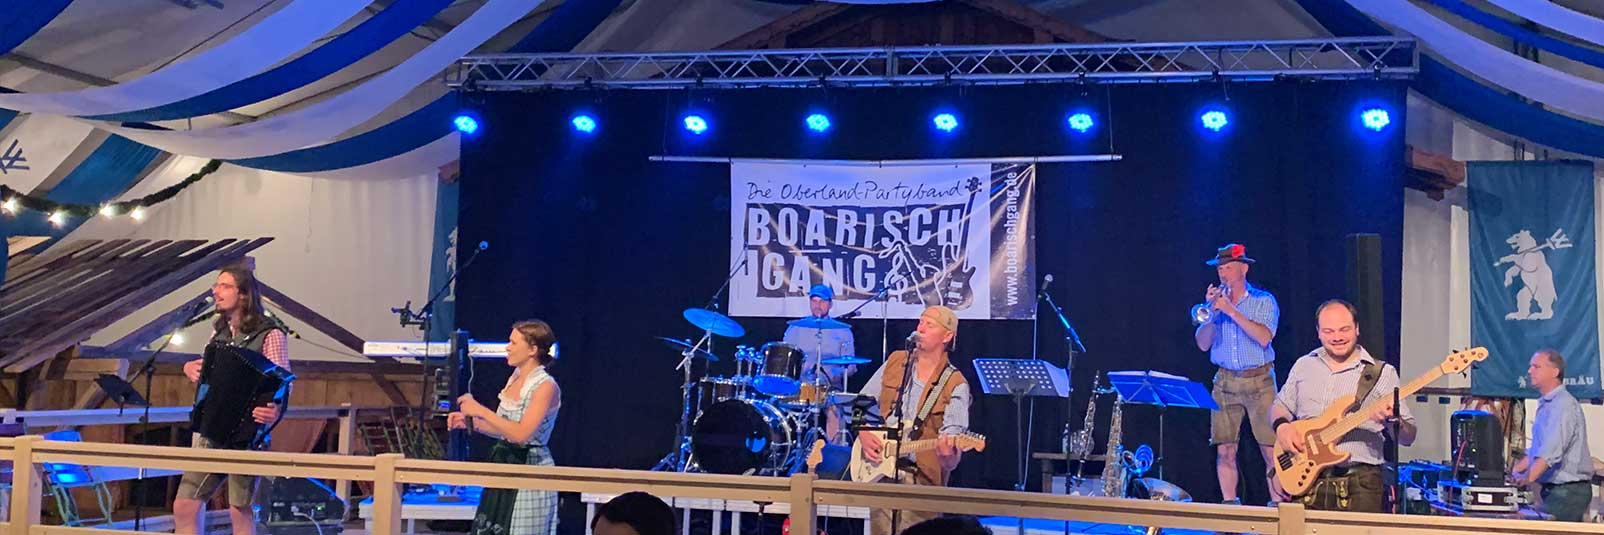 Oktoberfestband BoarischGäng